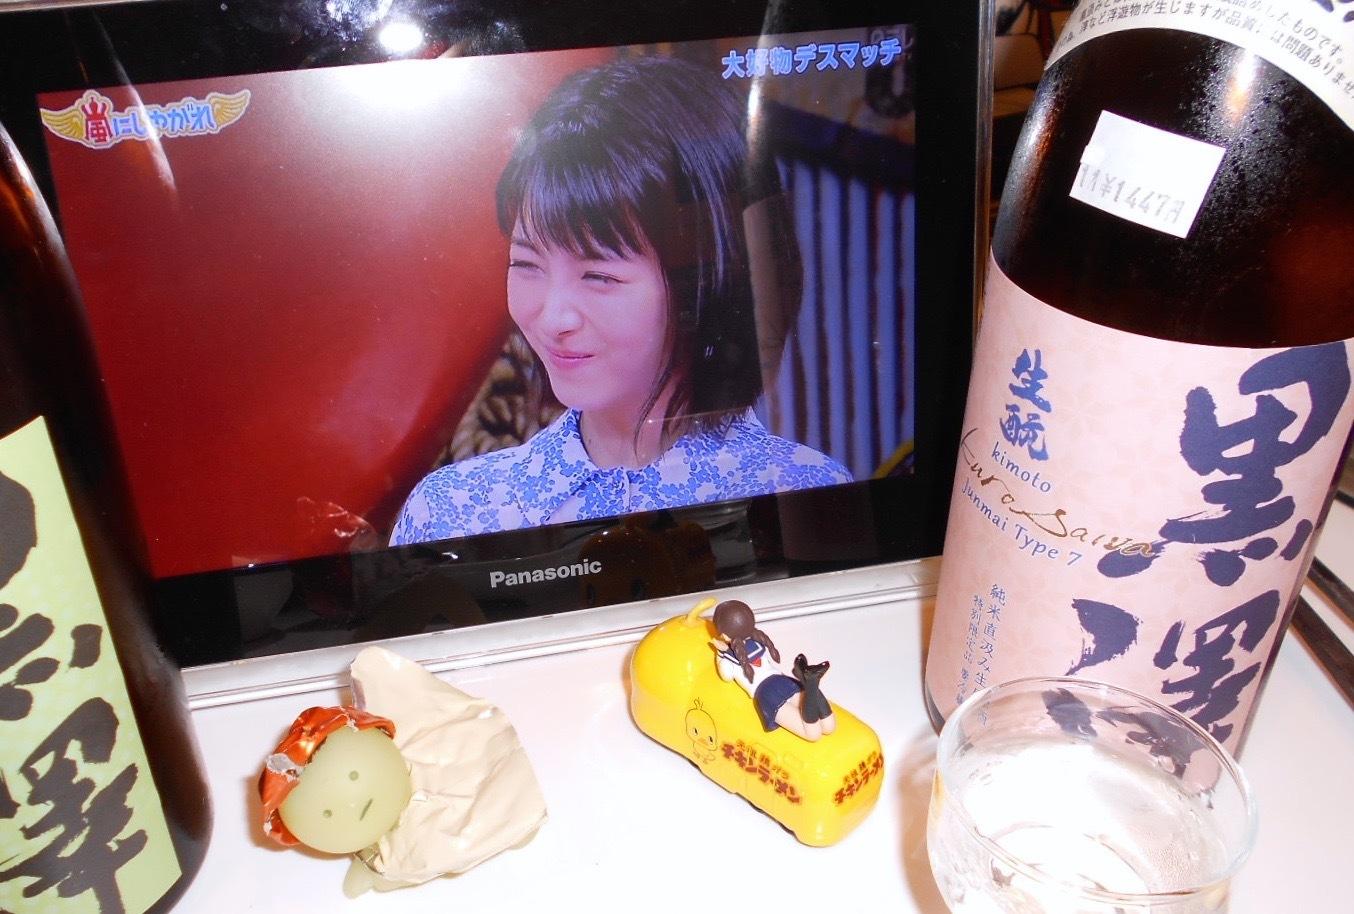 kurosawa_type-s30by2_6.jpg